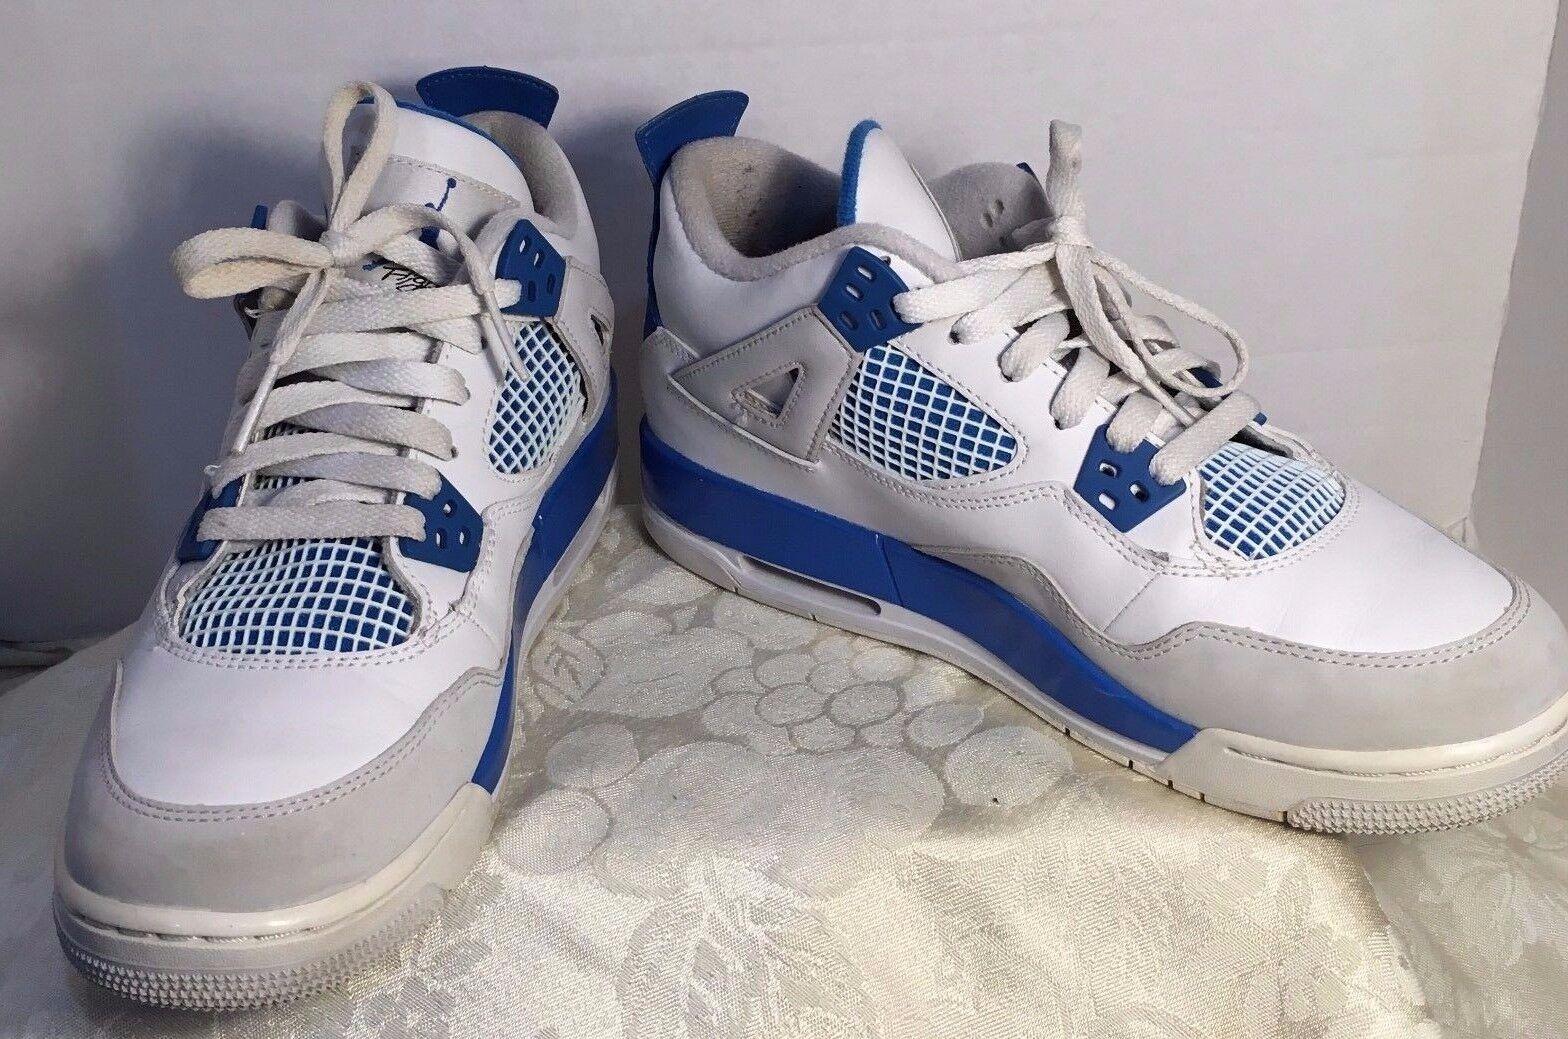 NIKE AIR JORDAN 4 RETRO BG WHITE-LEGEND BLUE Price reduction Wild casual shoes